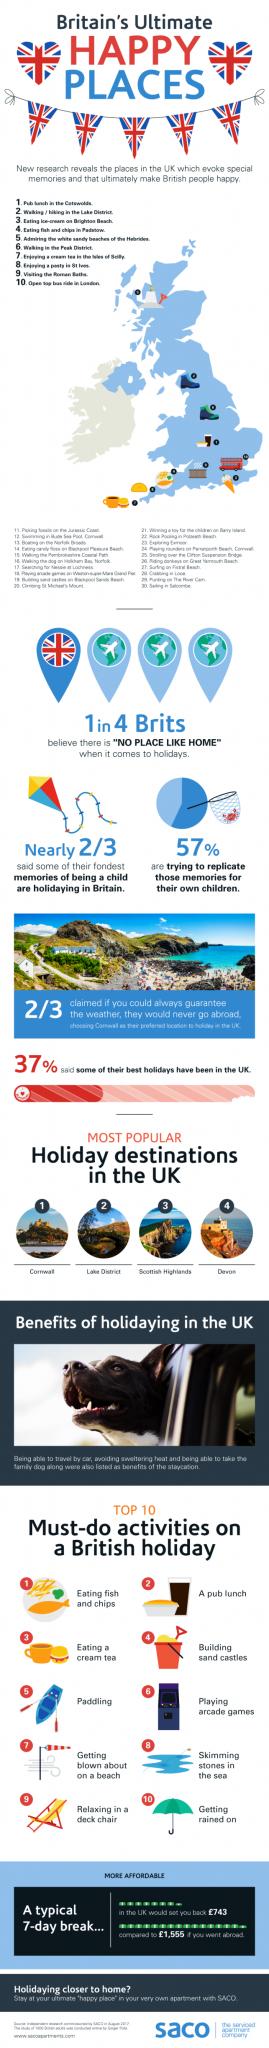 Britain's Ultimate Happy Places